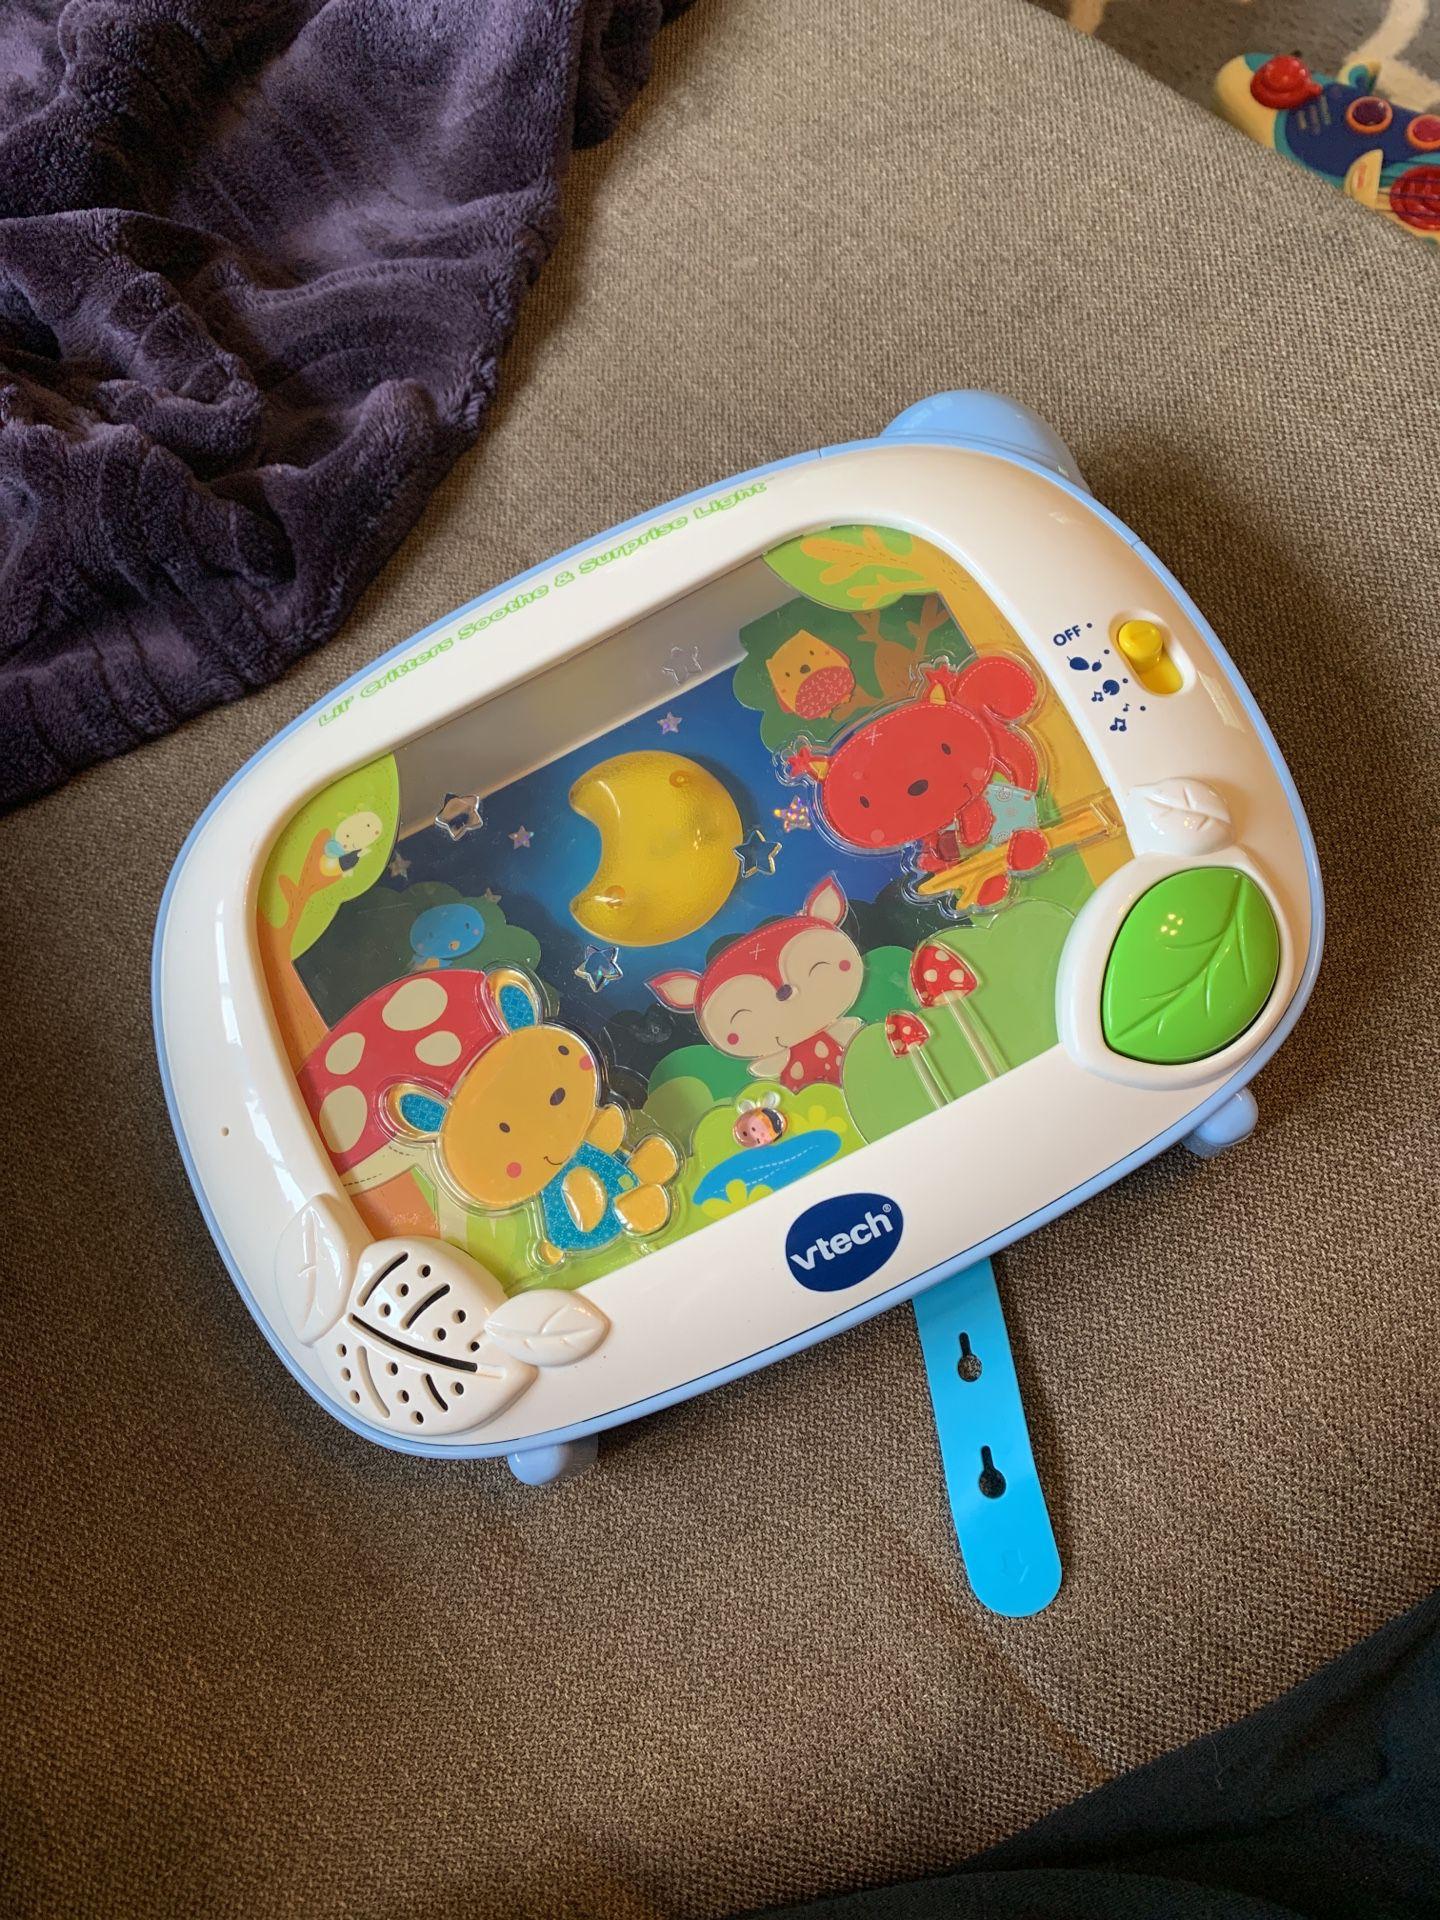 VTech Baby Crib toy